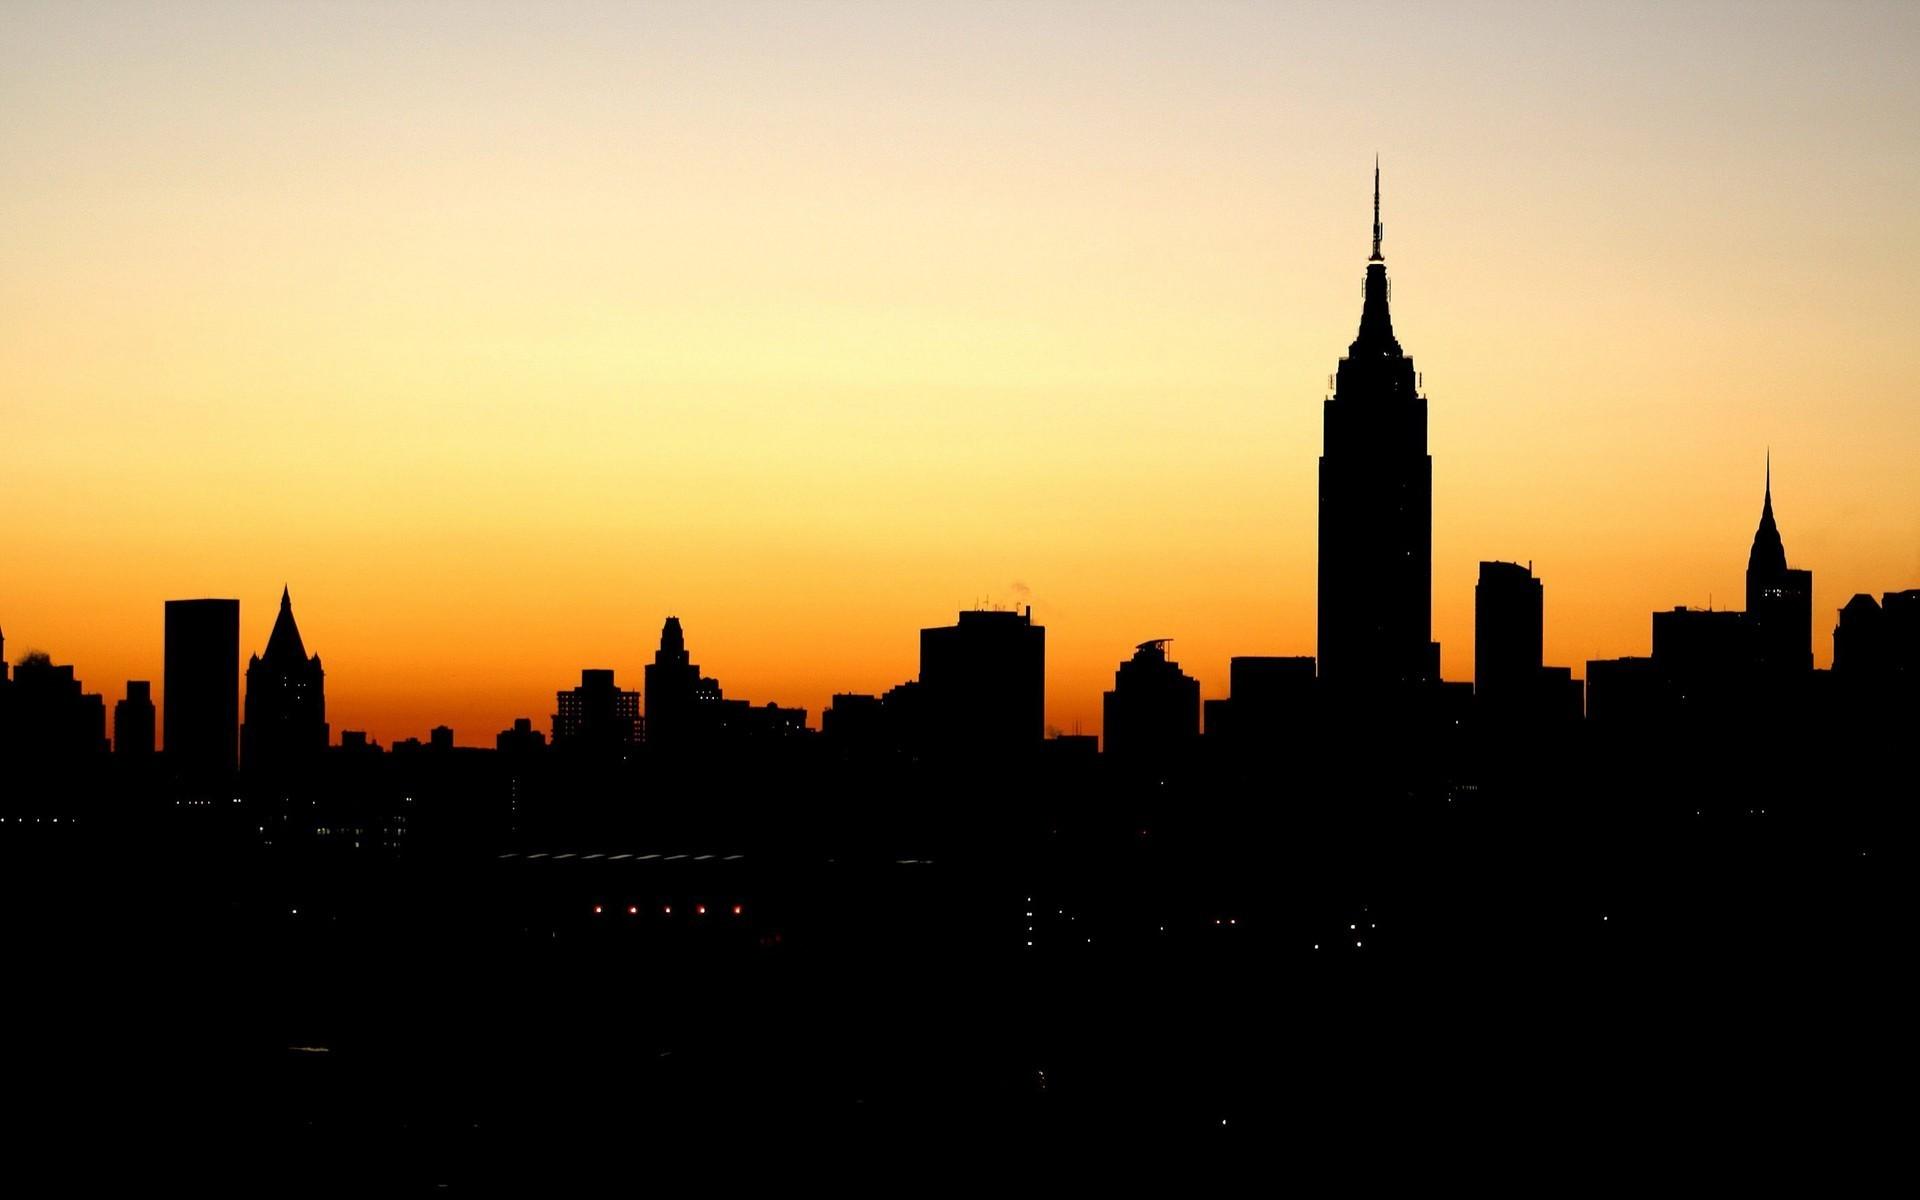 1920x1200 Empire State Building Silhouette New York Manhattan